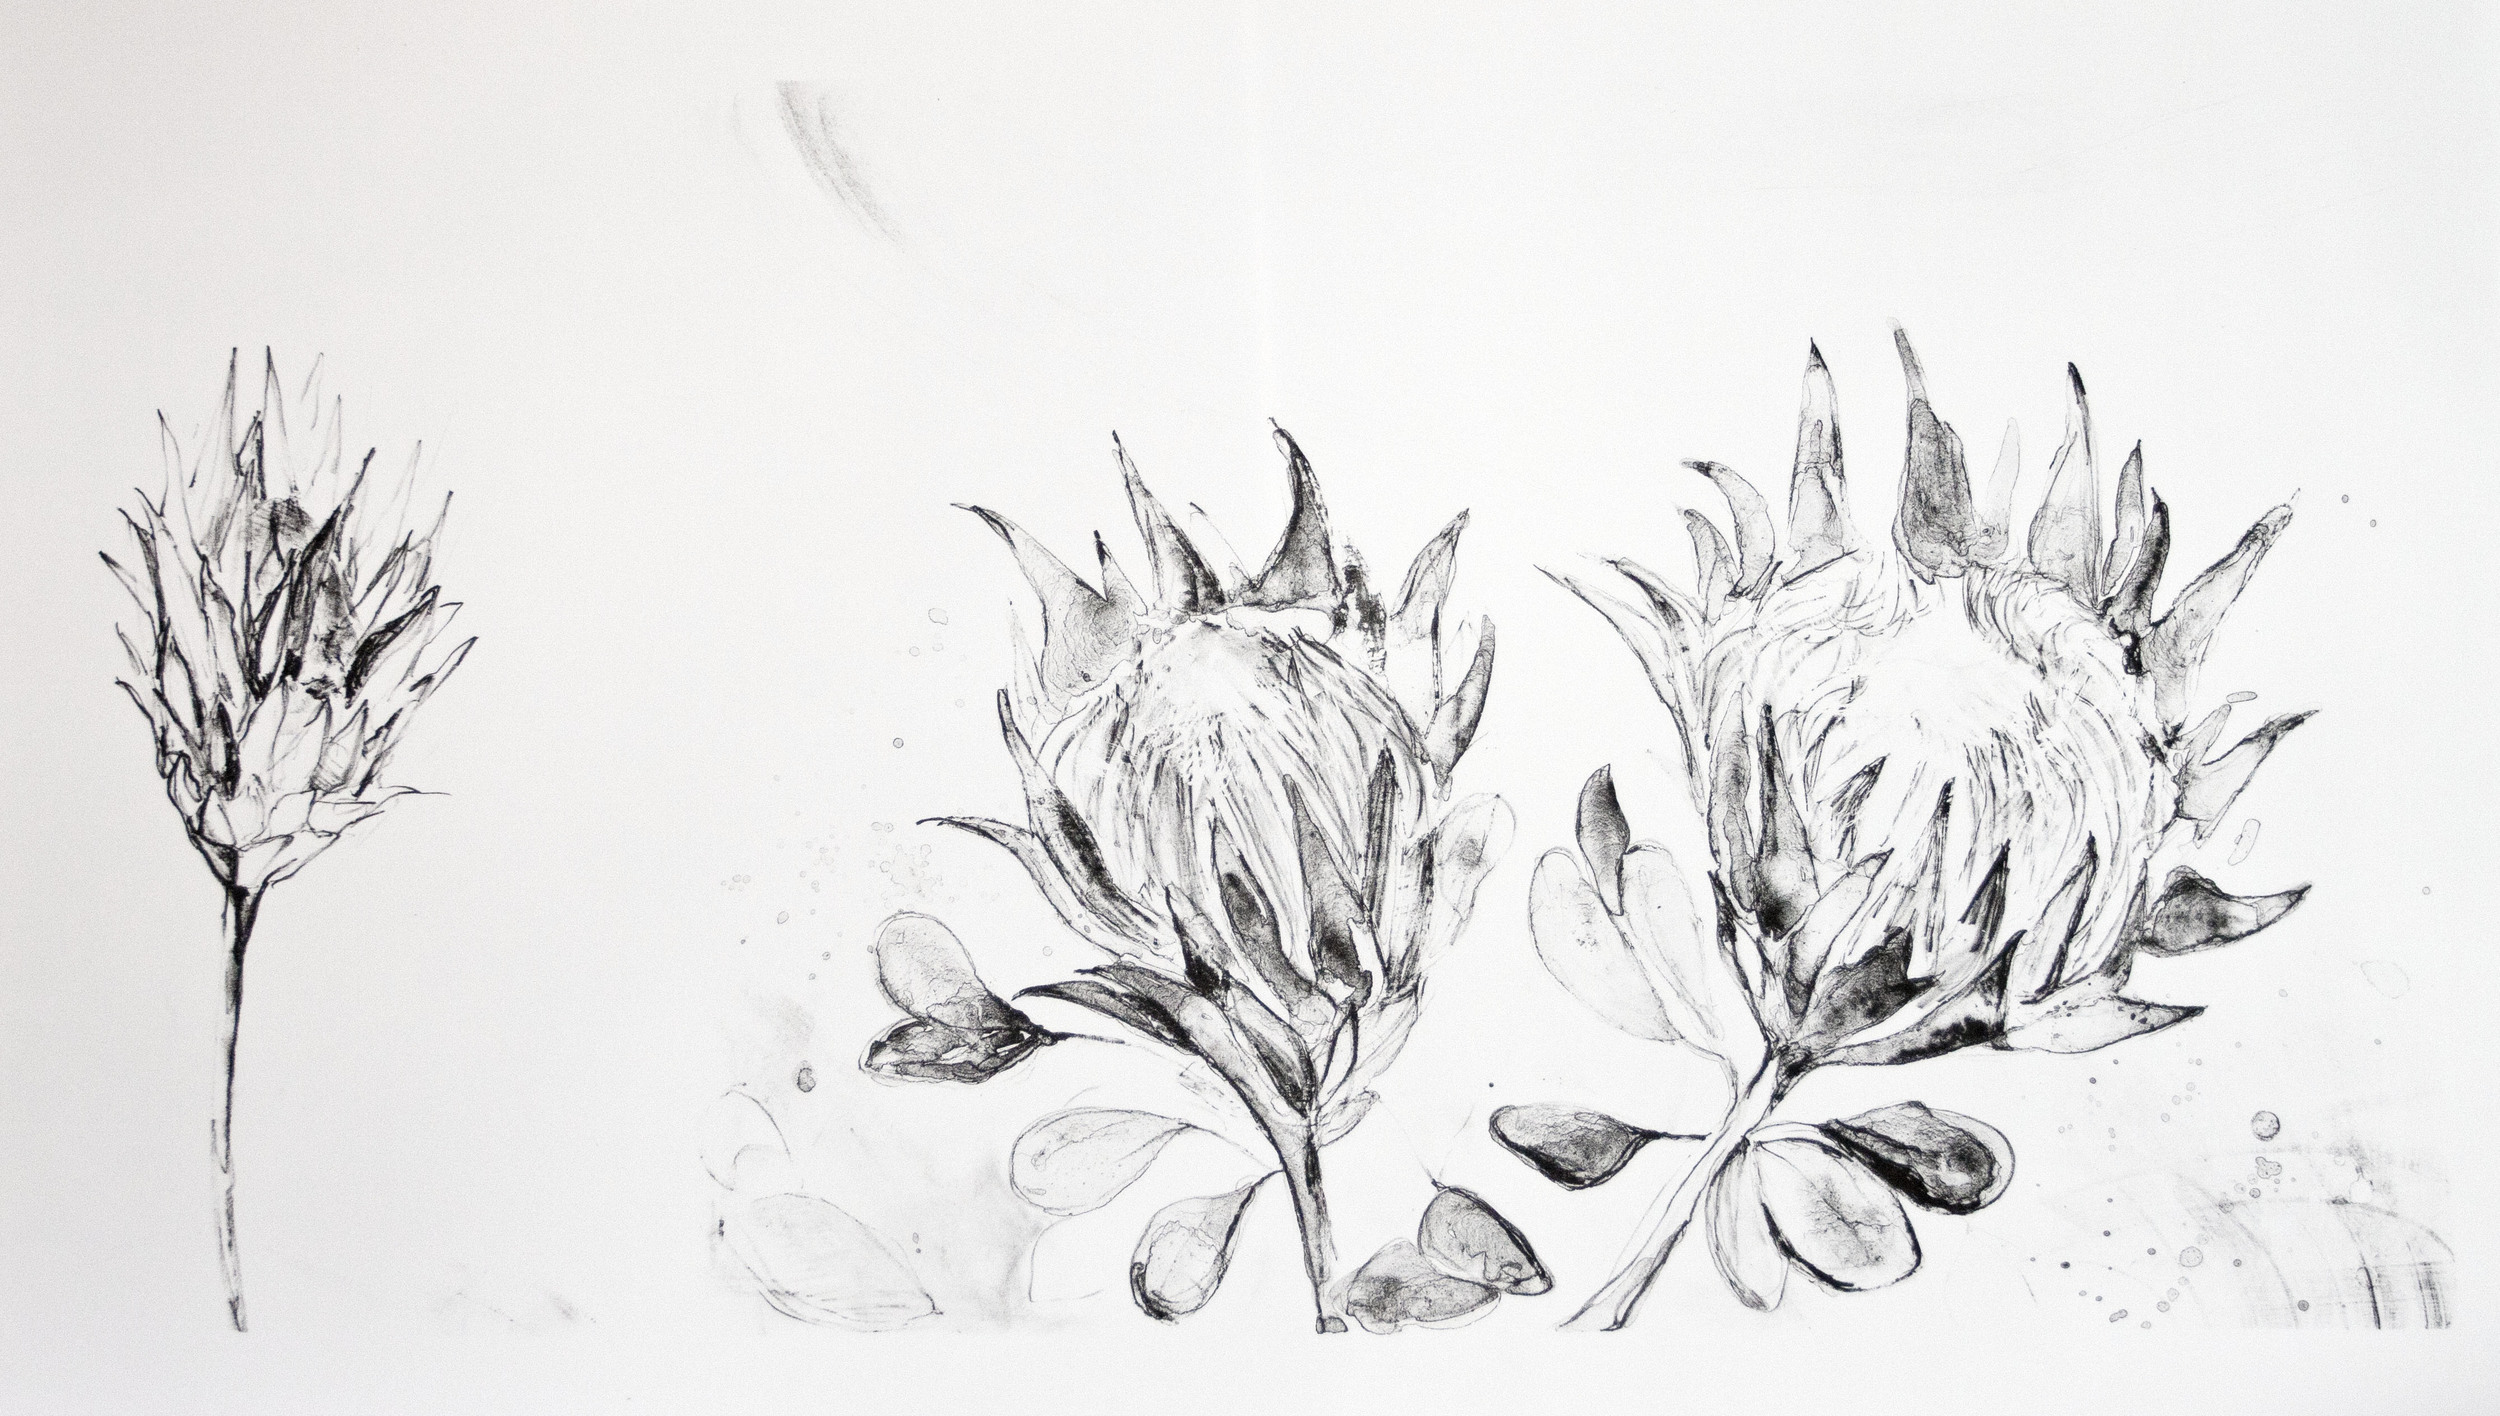 Proteaceae - King Protea   Lithograph. 2016  55 x 95cm  $850 (F)  $600 (UF)